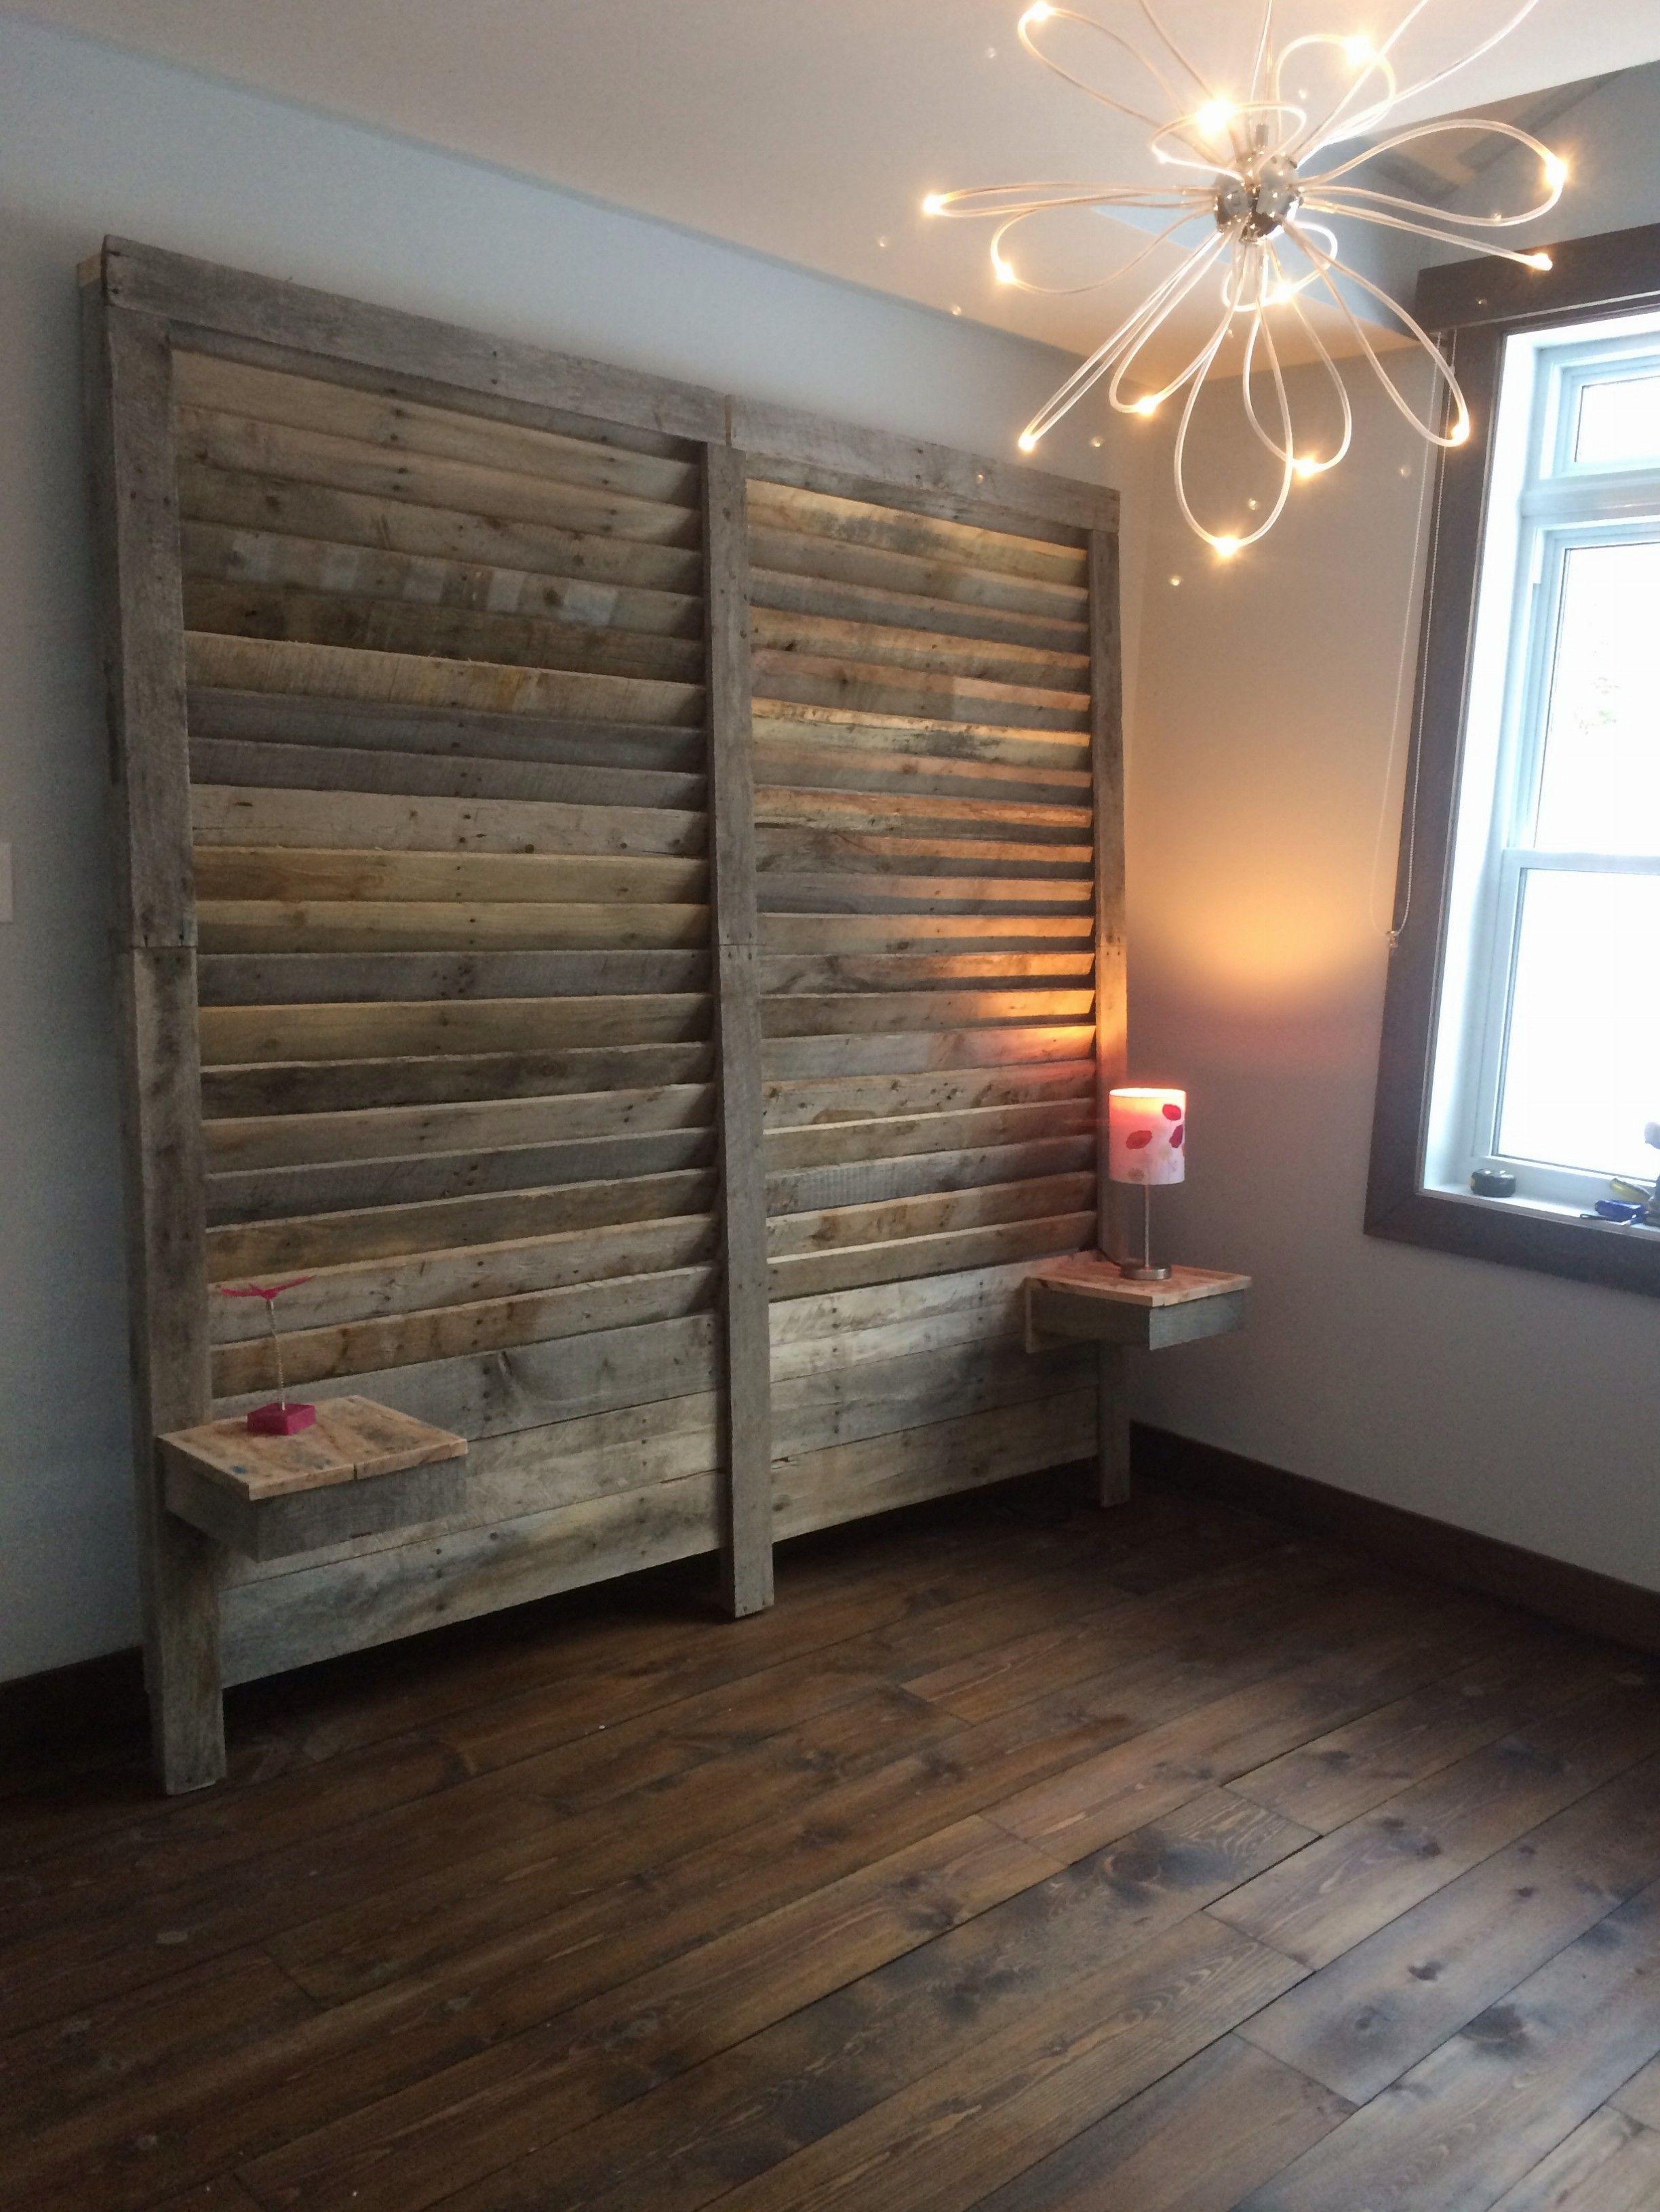 Pallet Bed Headboard With Side Tables | Garagenschränke ...